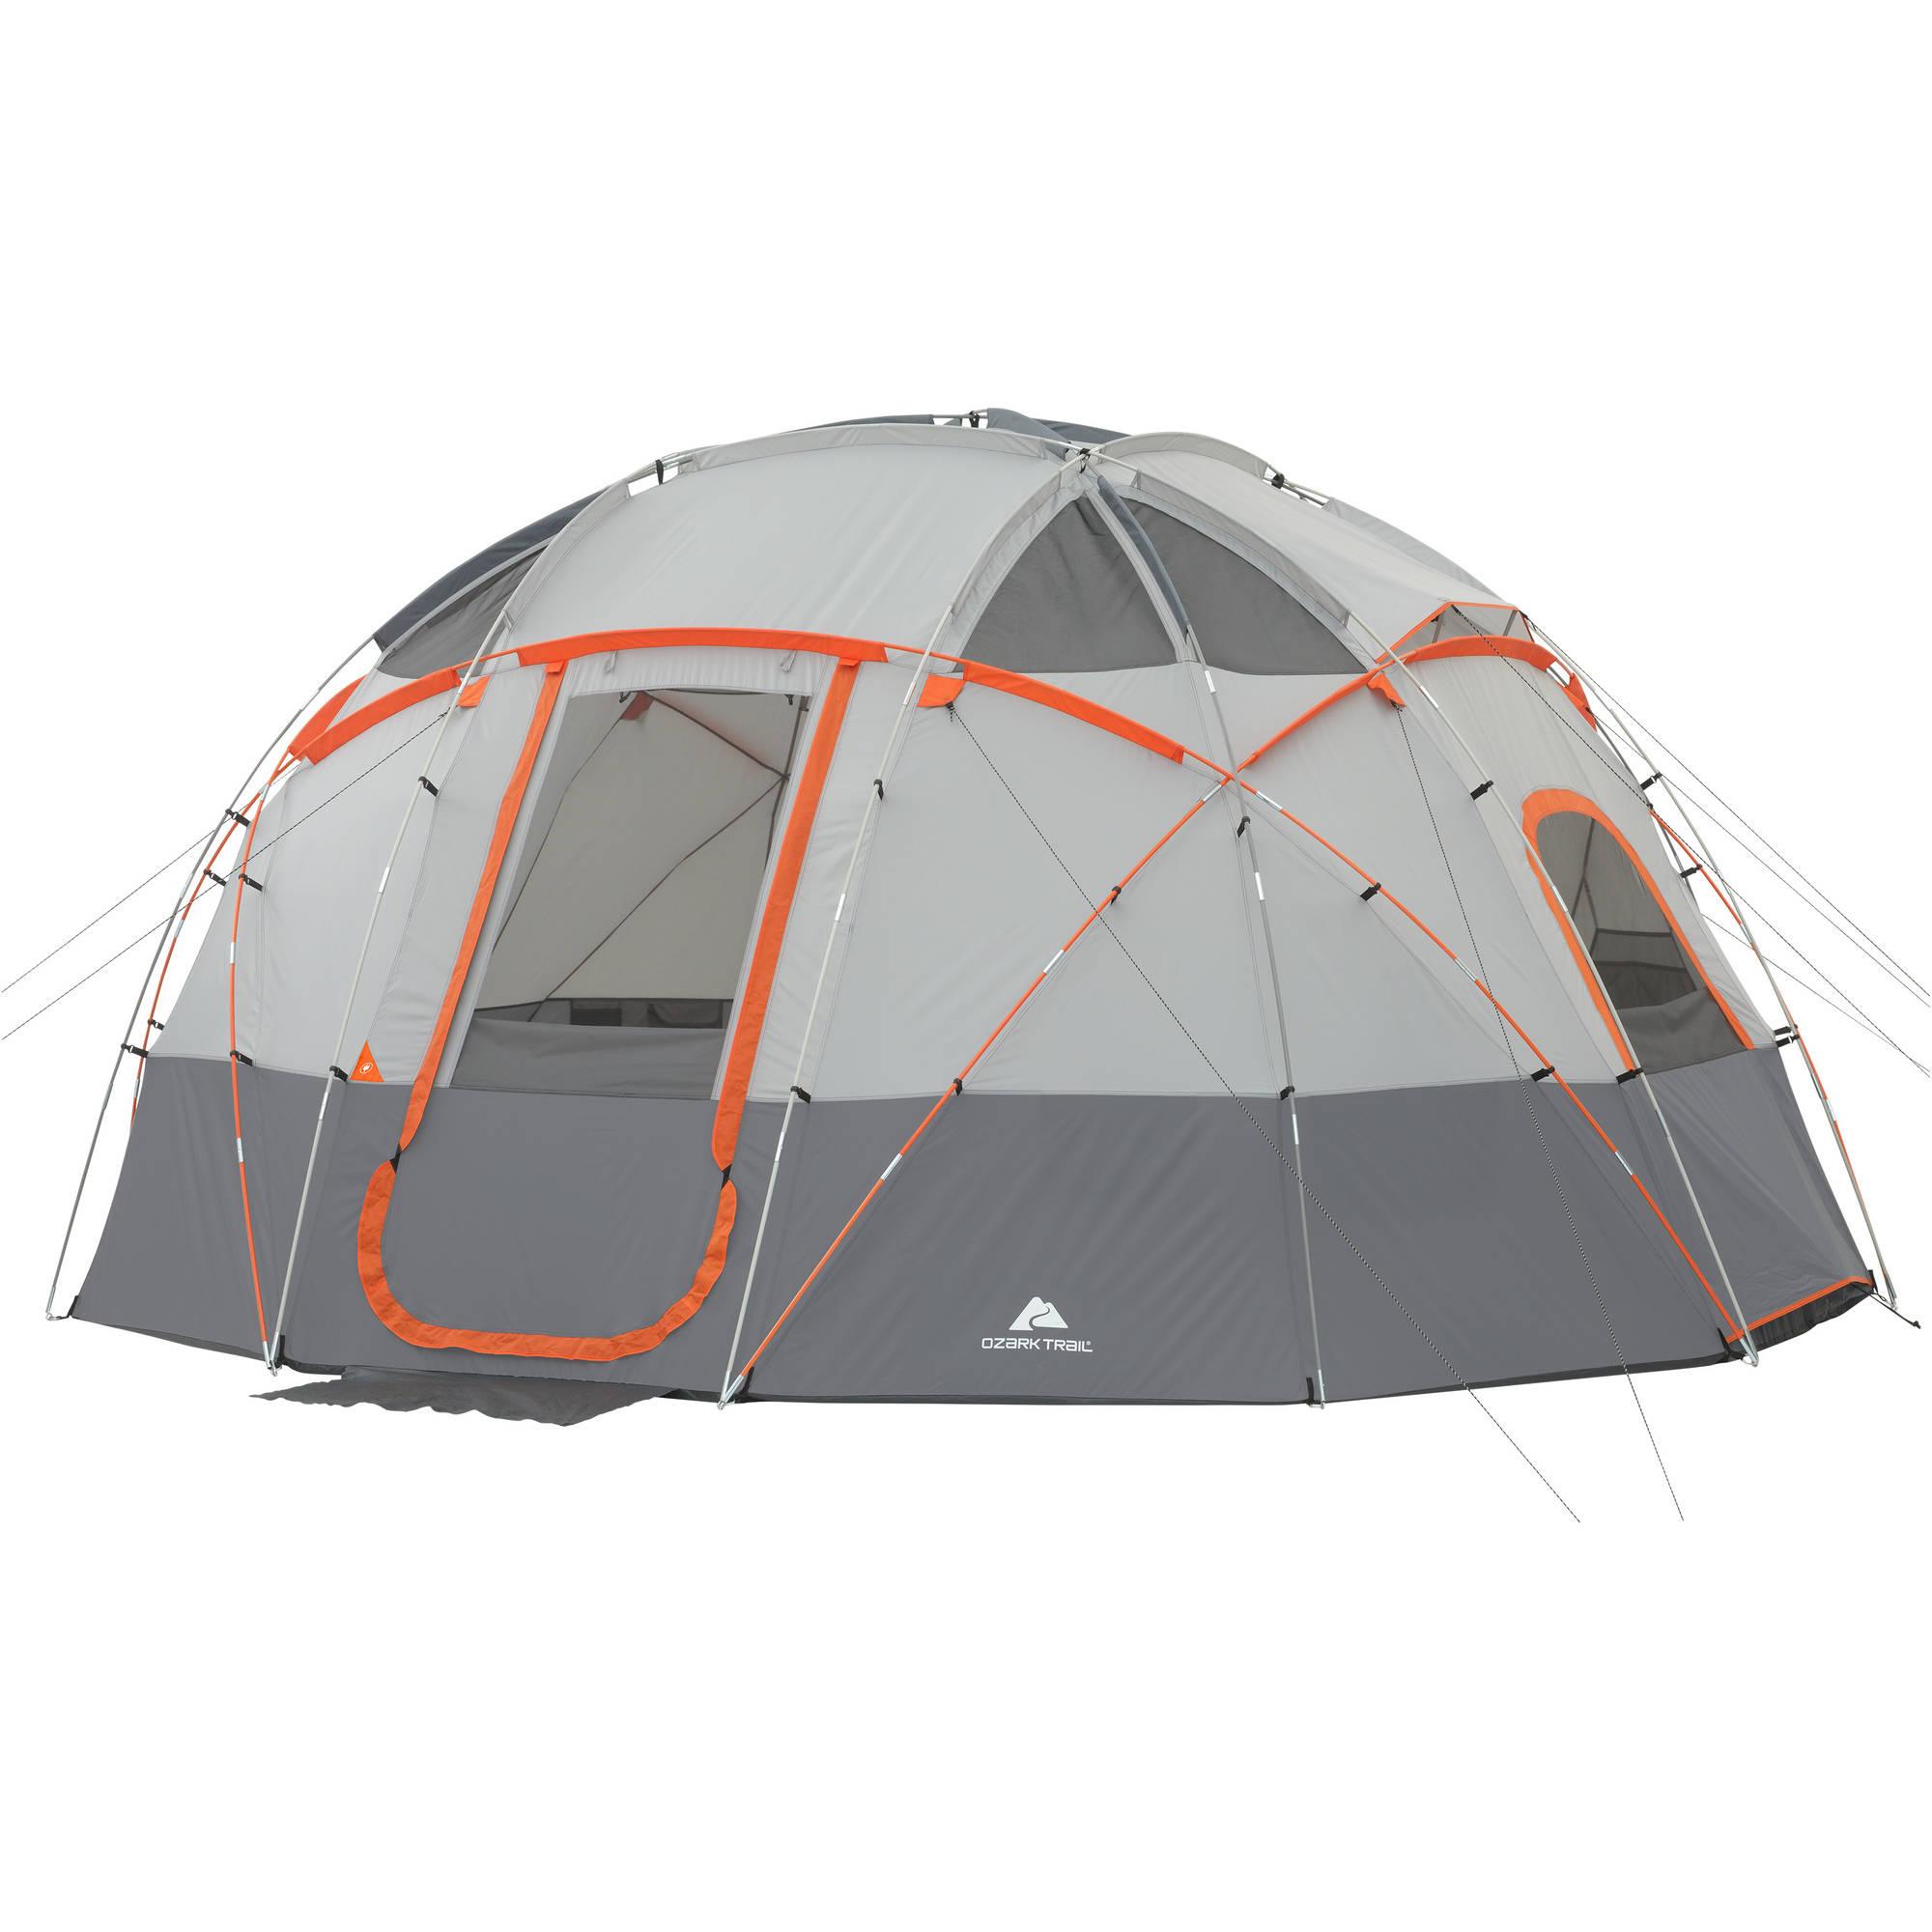 Ozark Trail 12 Person Sphere Tent $80 @ Walmart + Free Shipping